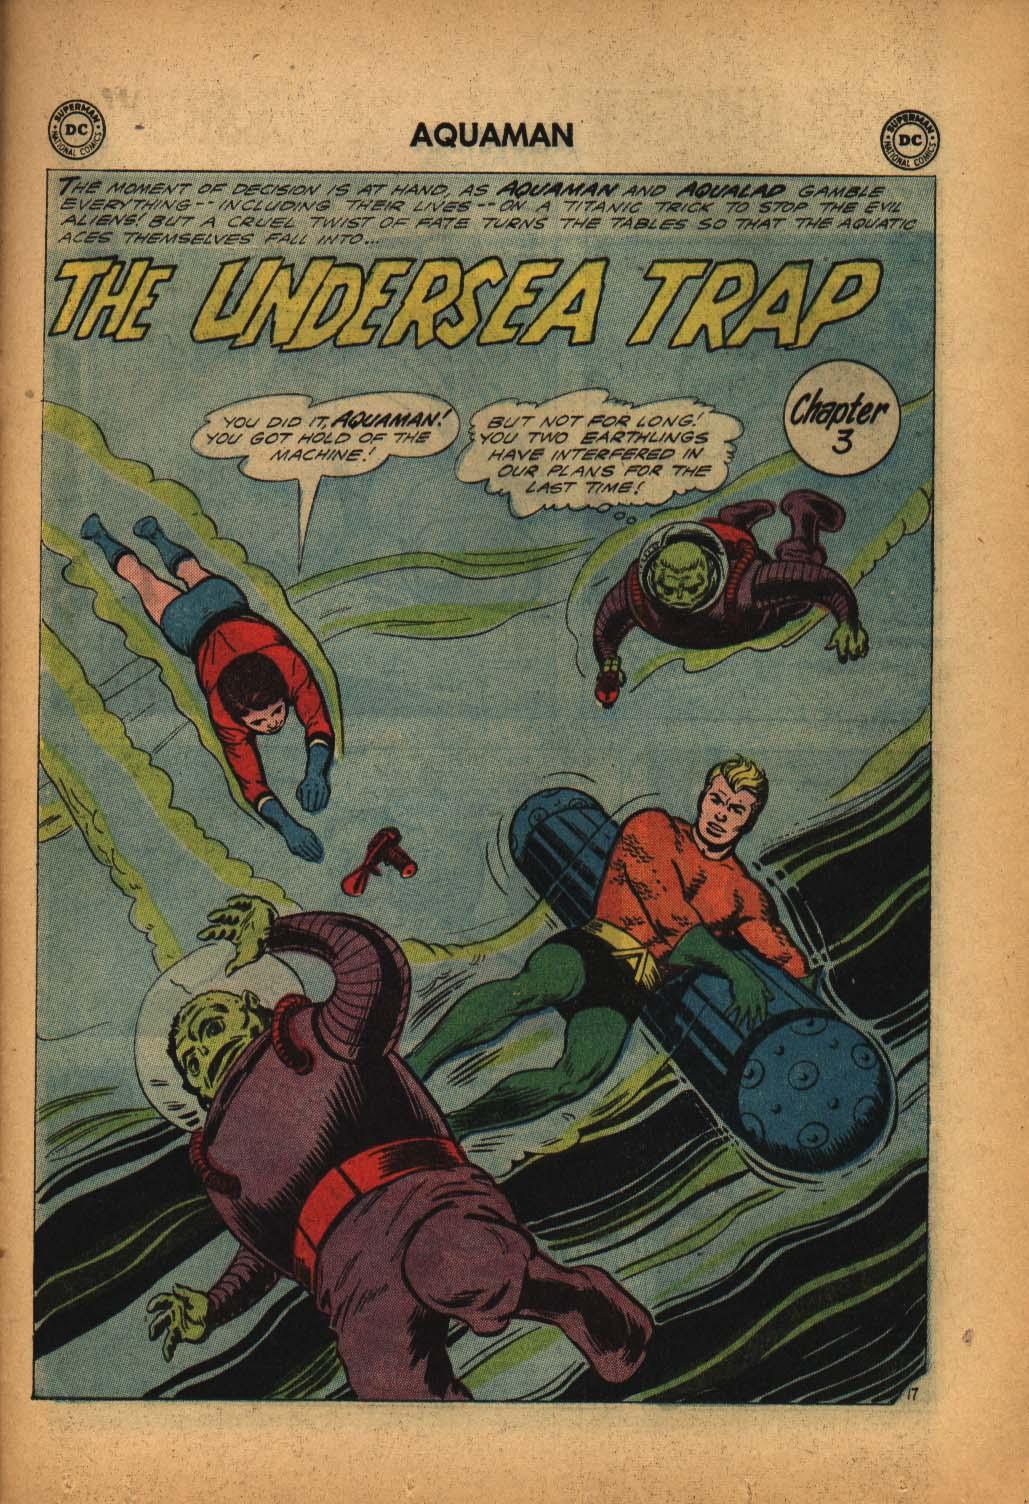 Read online Aquaman (1962) comic -  Issue #4 - 25